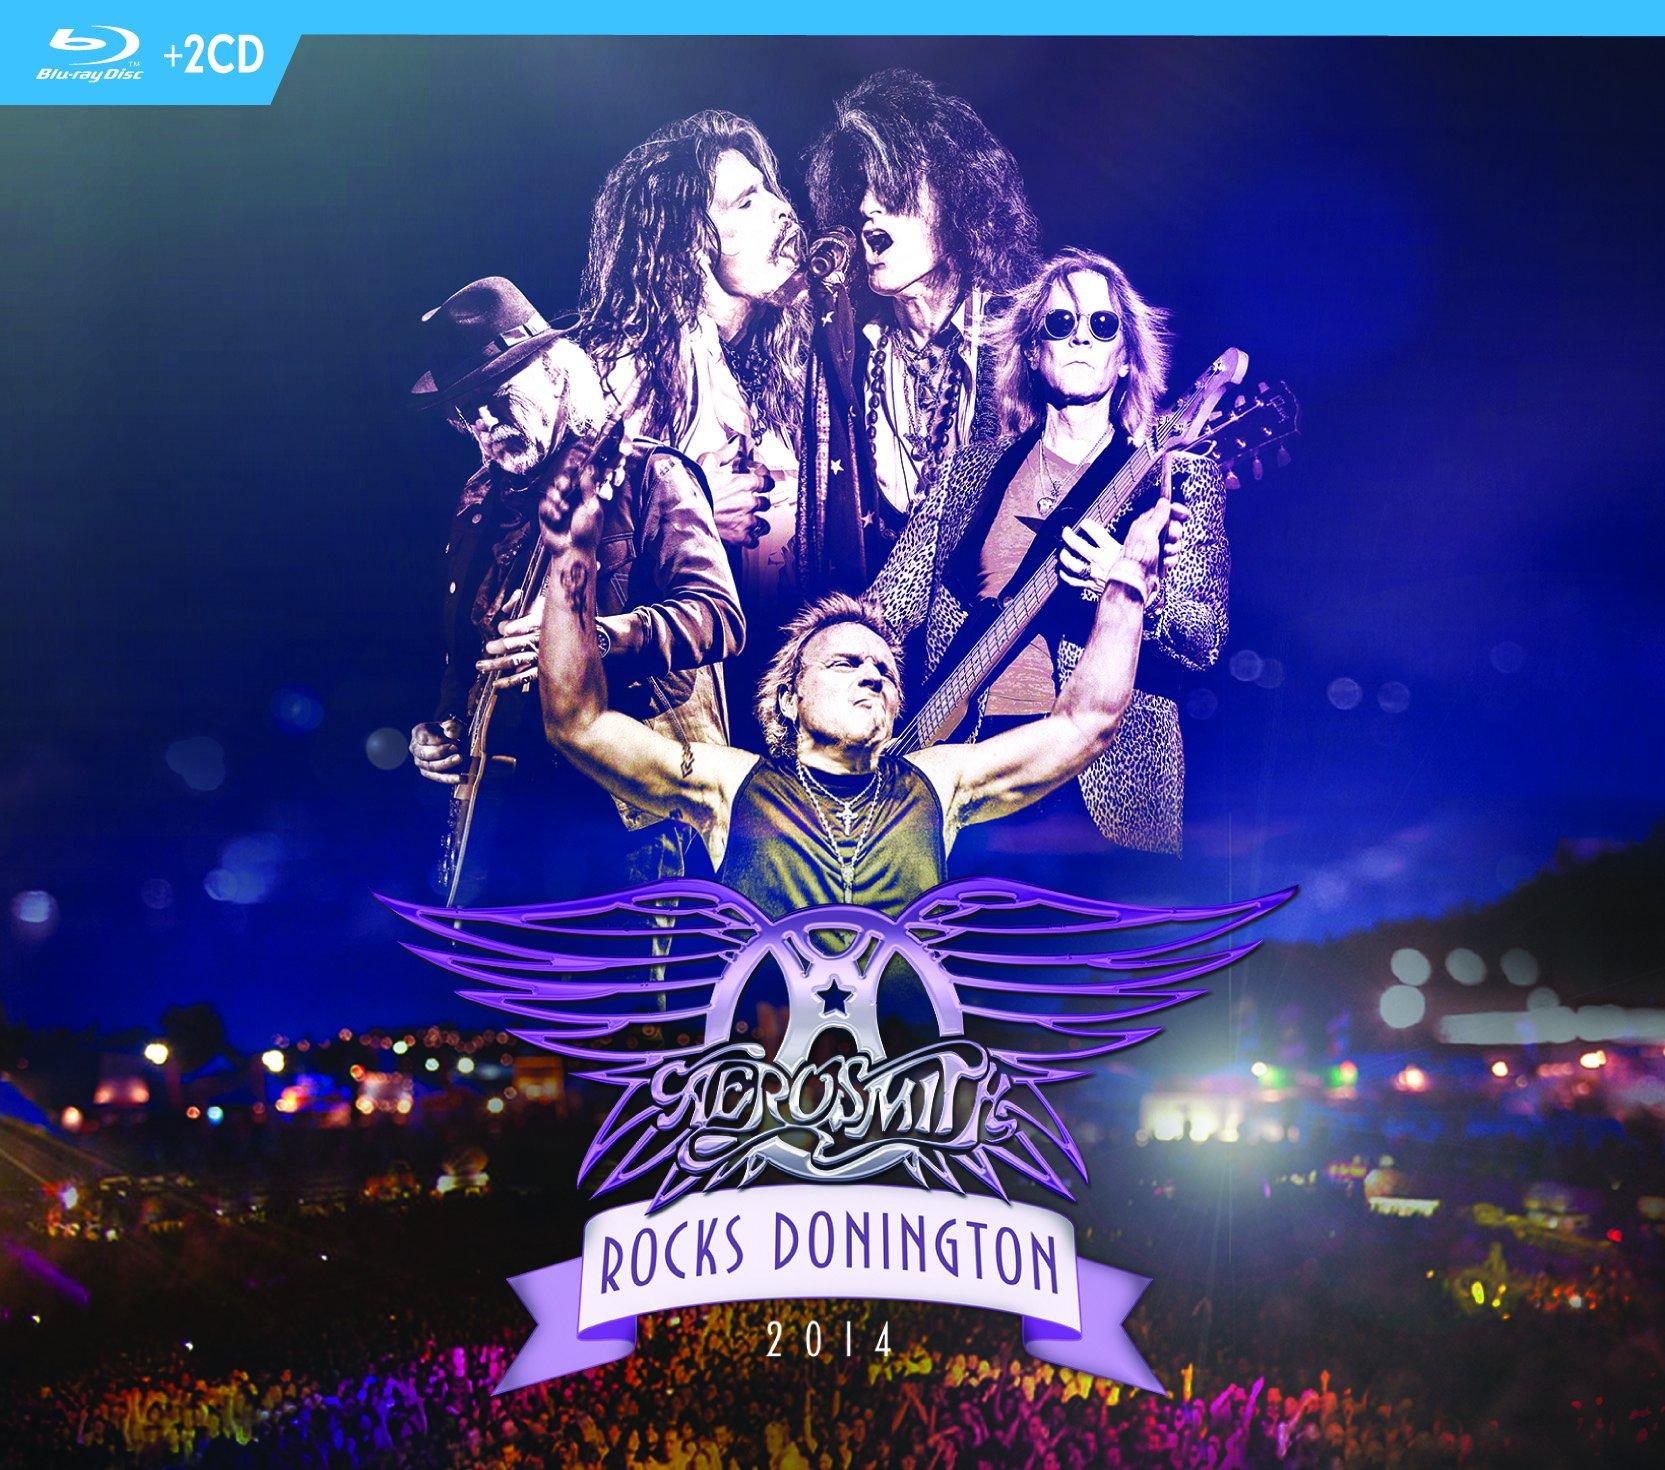 Blu-ray : Aerosmith - Rocks Donington 2014 (With CD, 3 Disc)